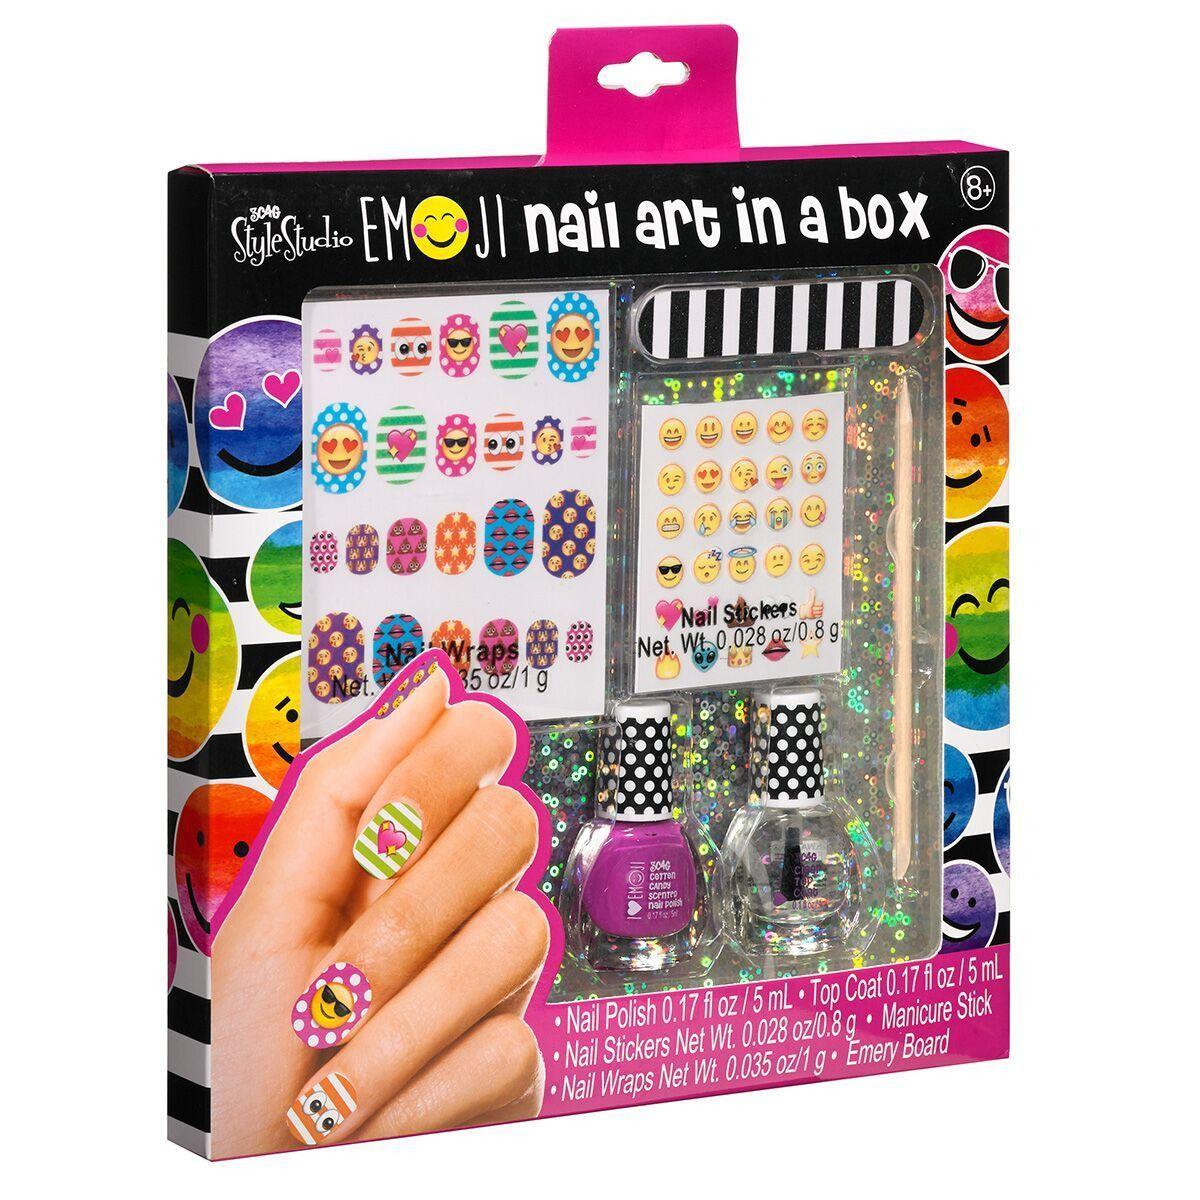 Nail Art In A Box Emoji Gifts For Girls Tween Teen Nails